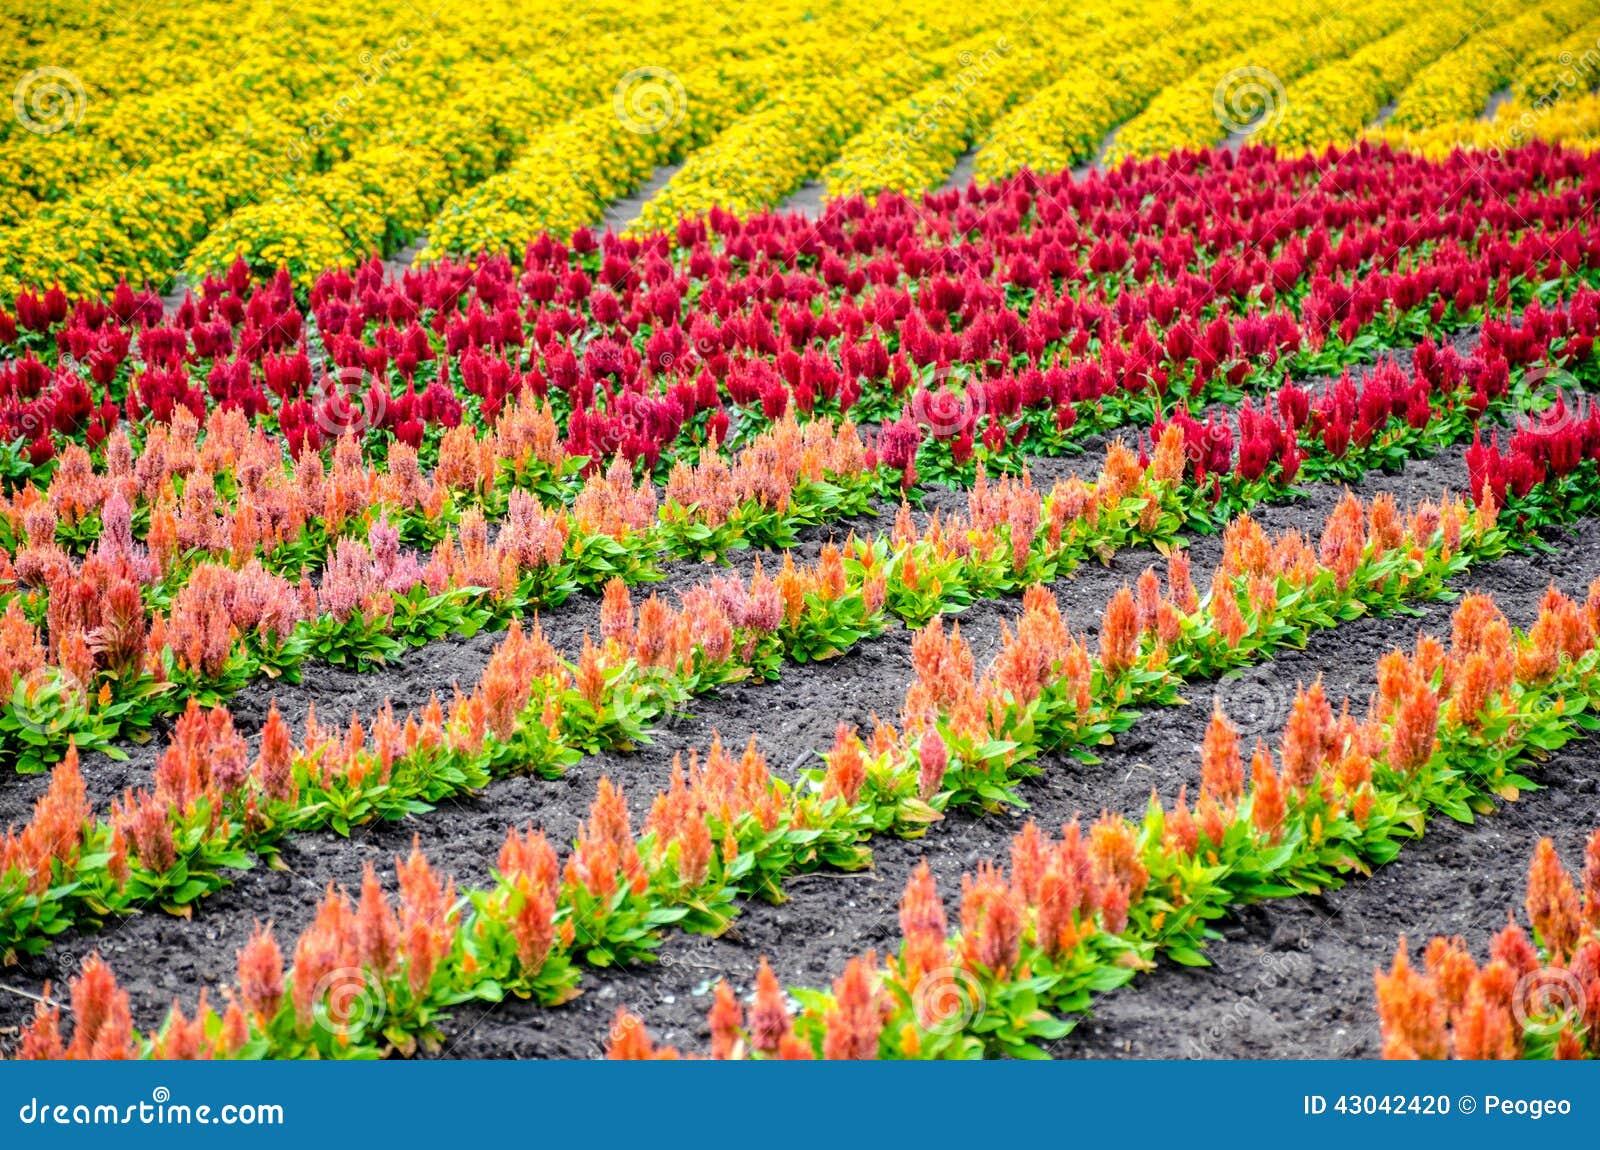 Row Flower Garden : Colorful rows of flower garden stock photo image